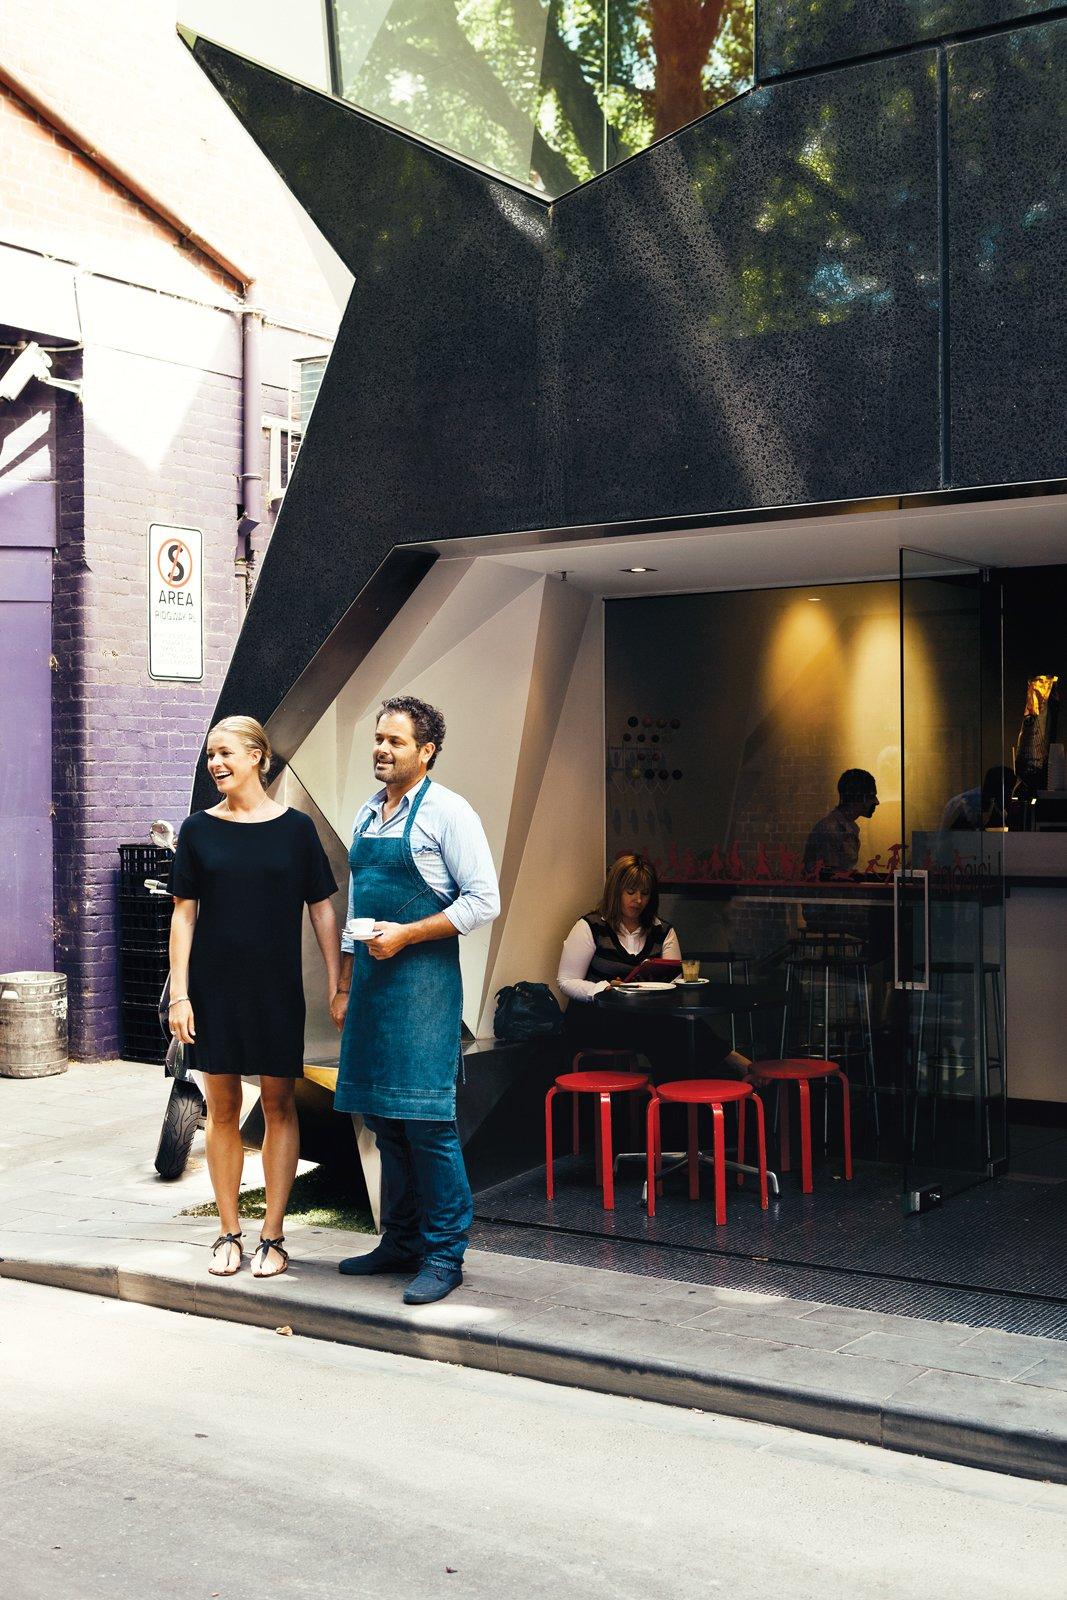 Liaison Cafe  Photo 4 of 24 in Exploring Melbourne, Australia